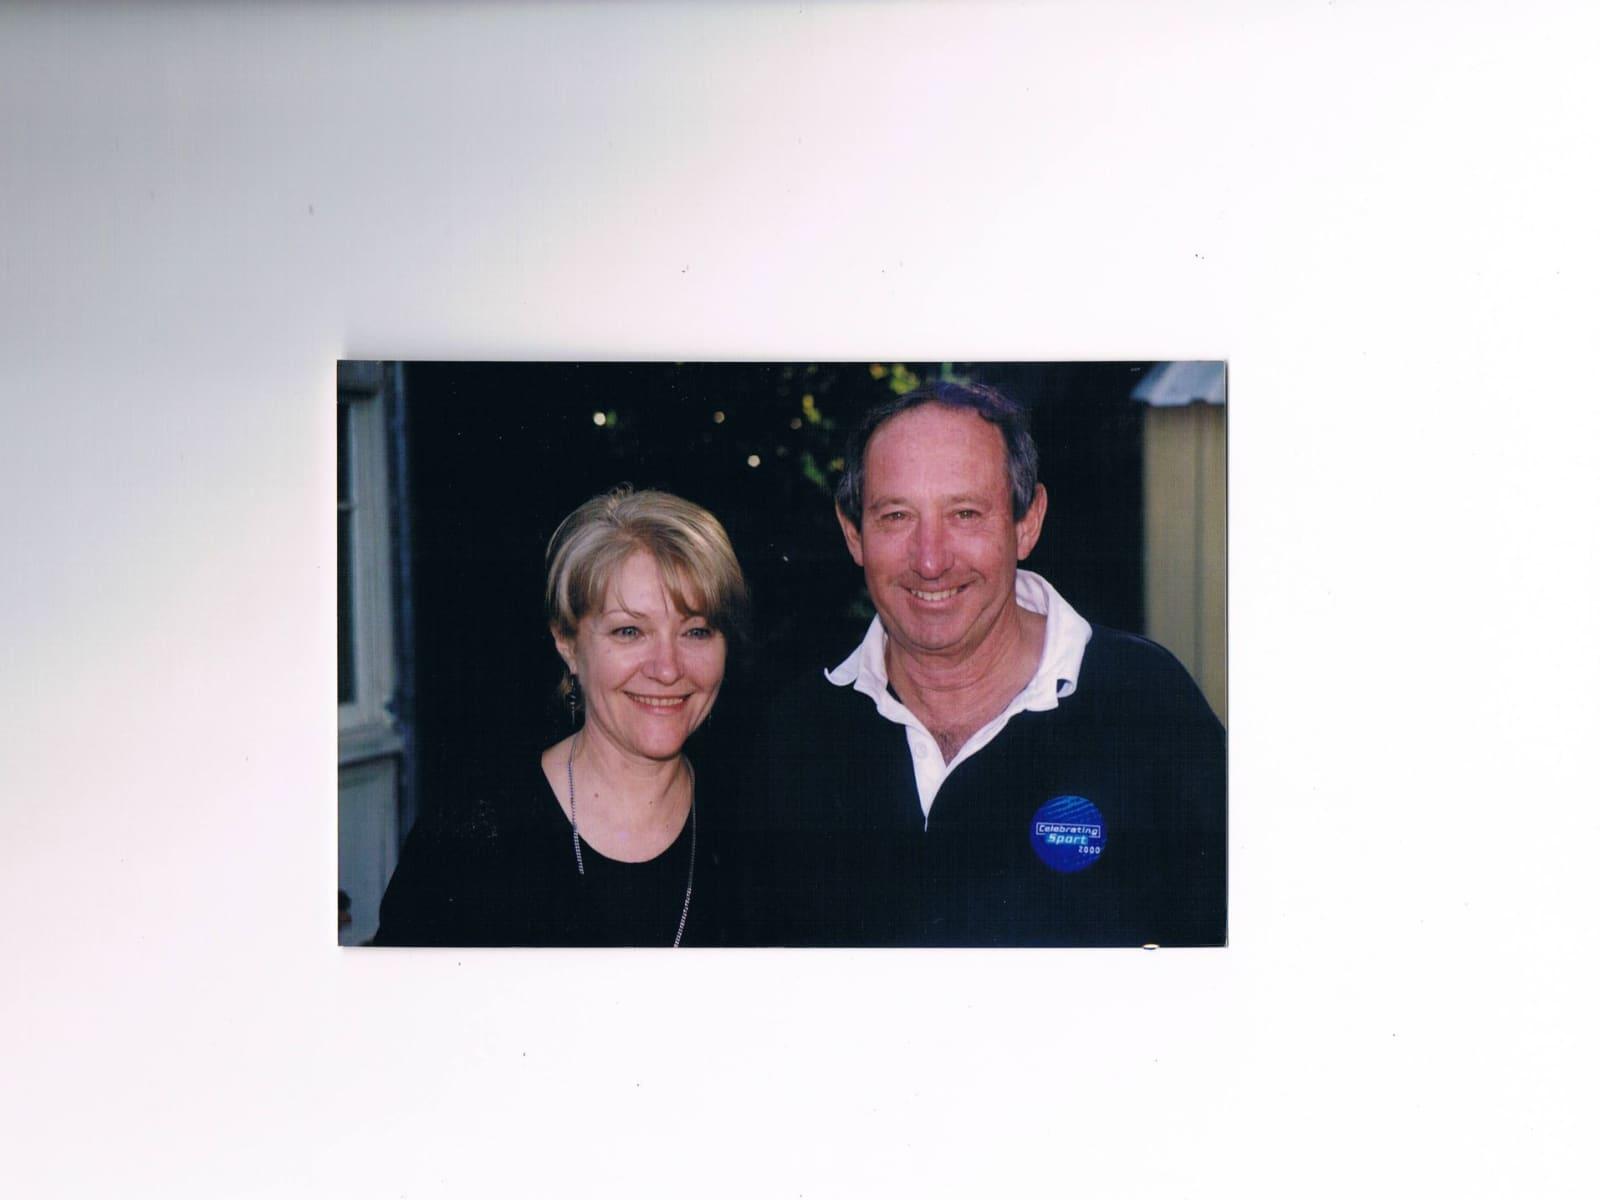 Laura m & John from Gold Coast, Queensland, Australia